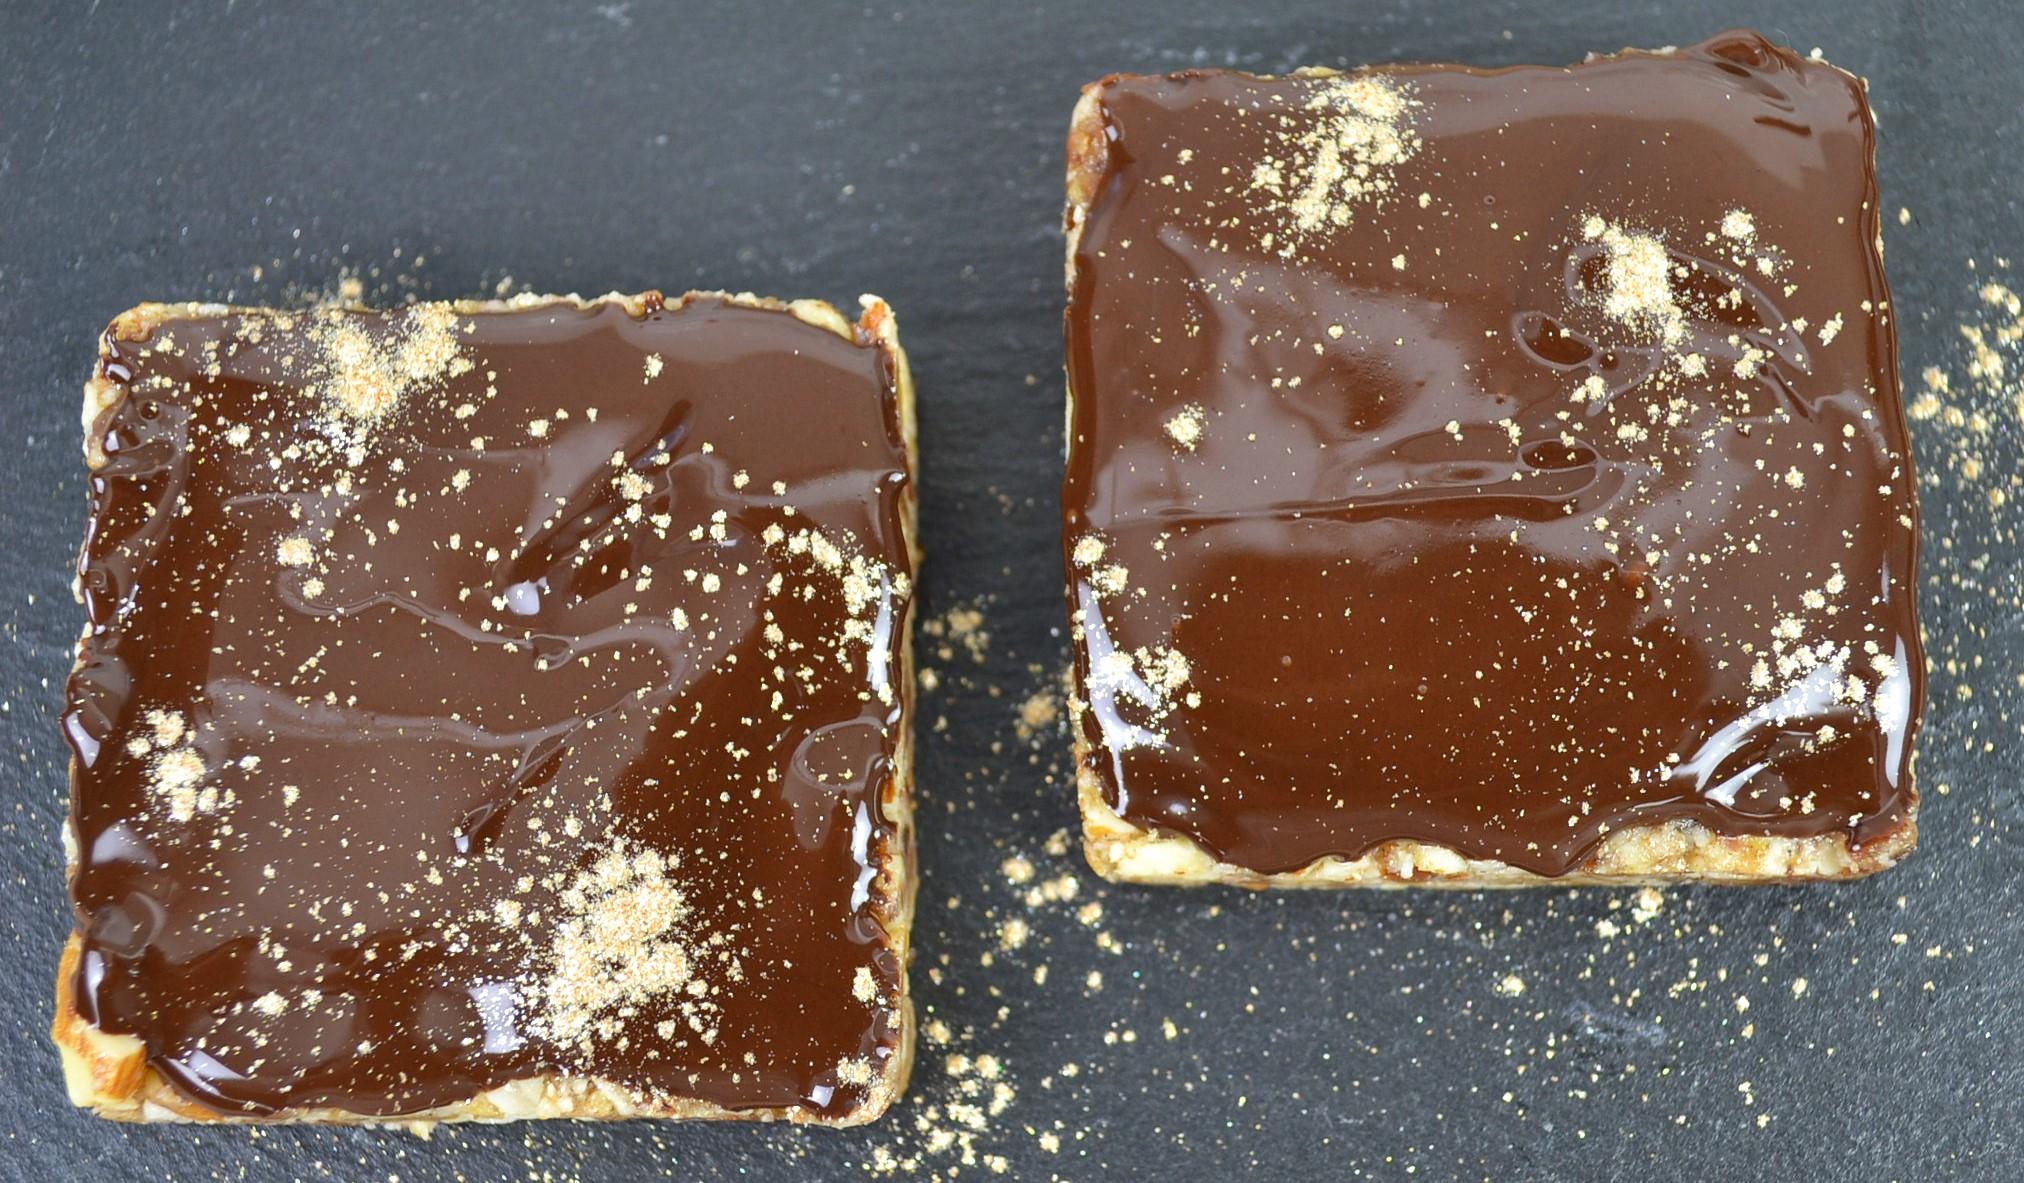 Cardamom and Almond Chocolate Vegan Bars